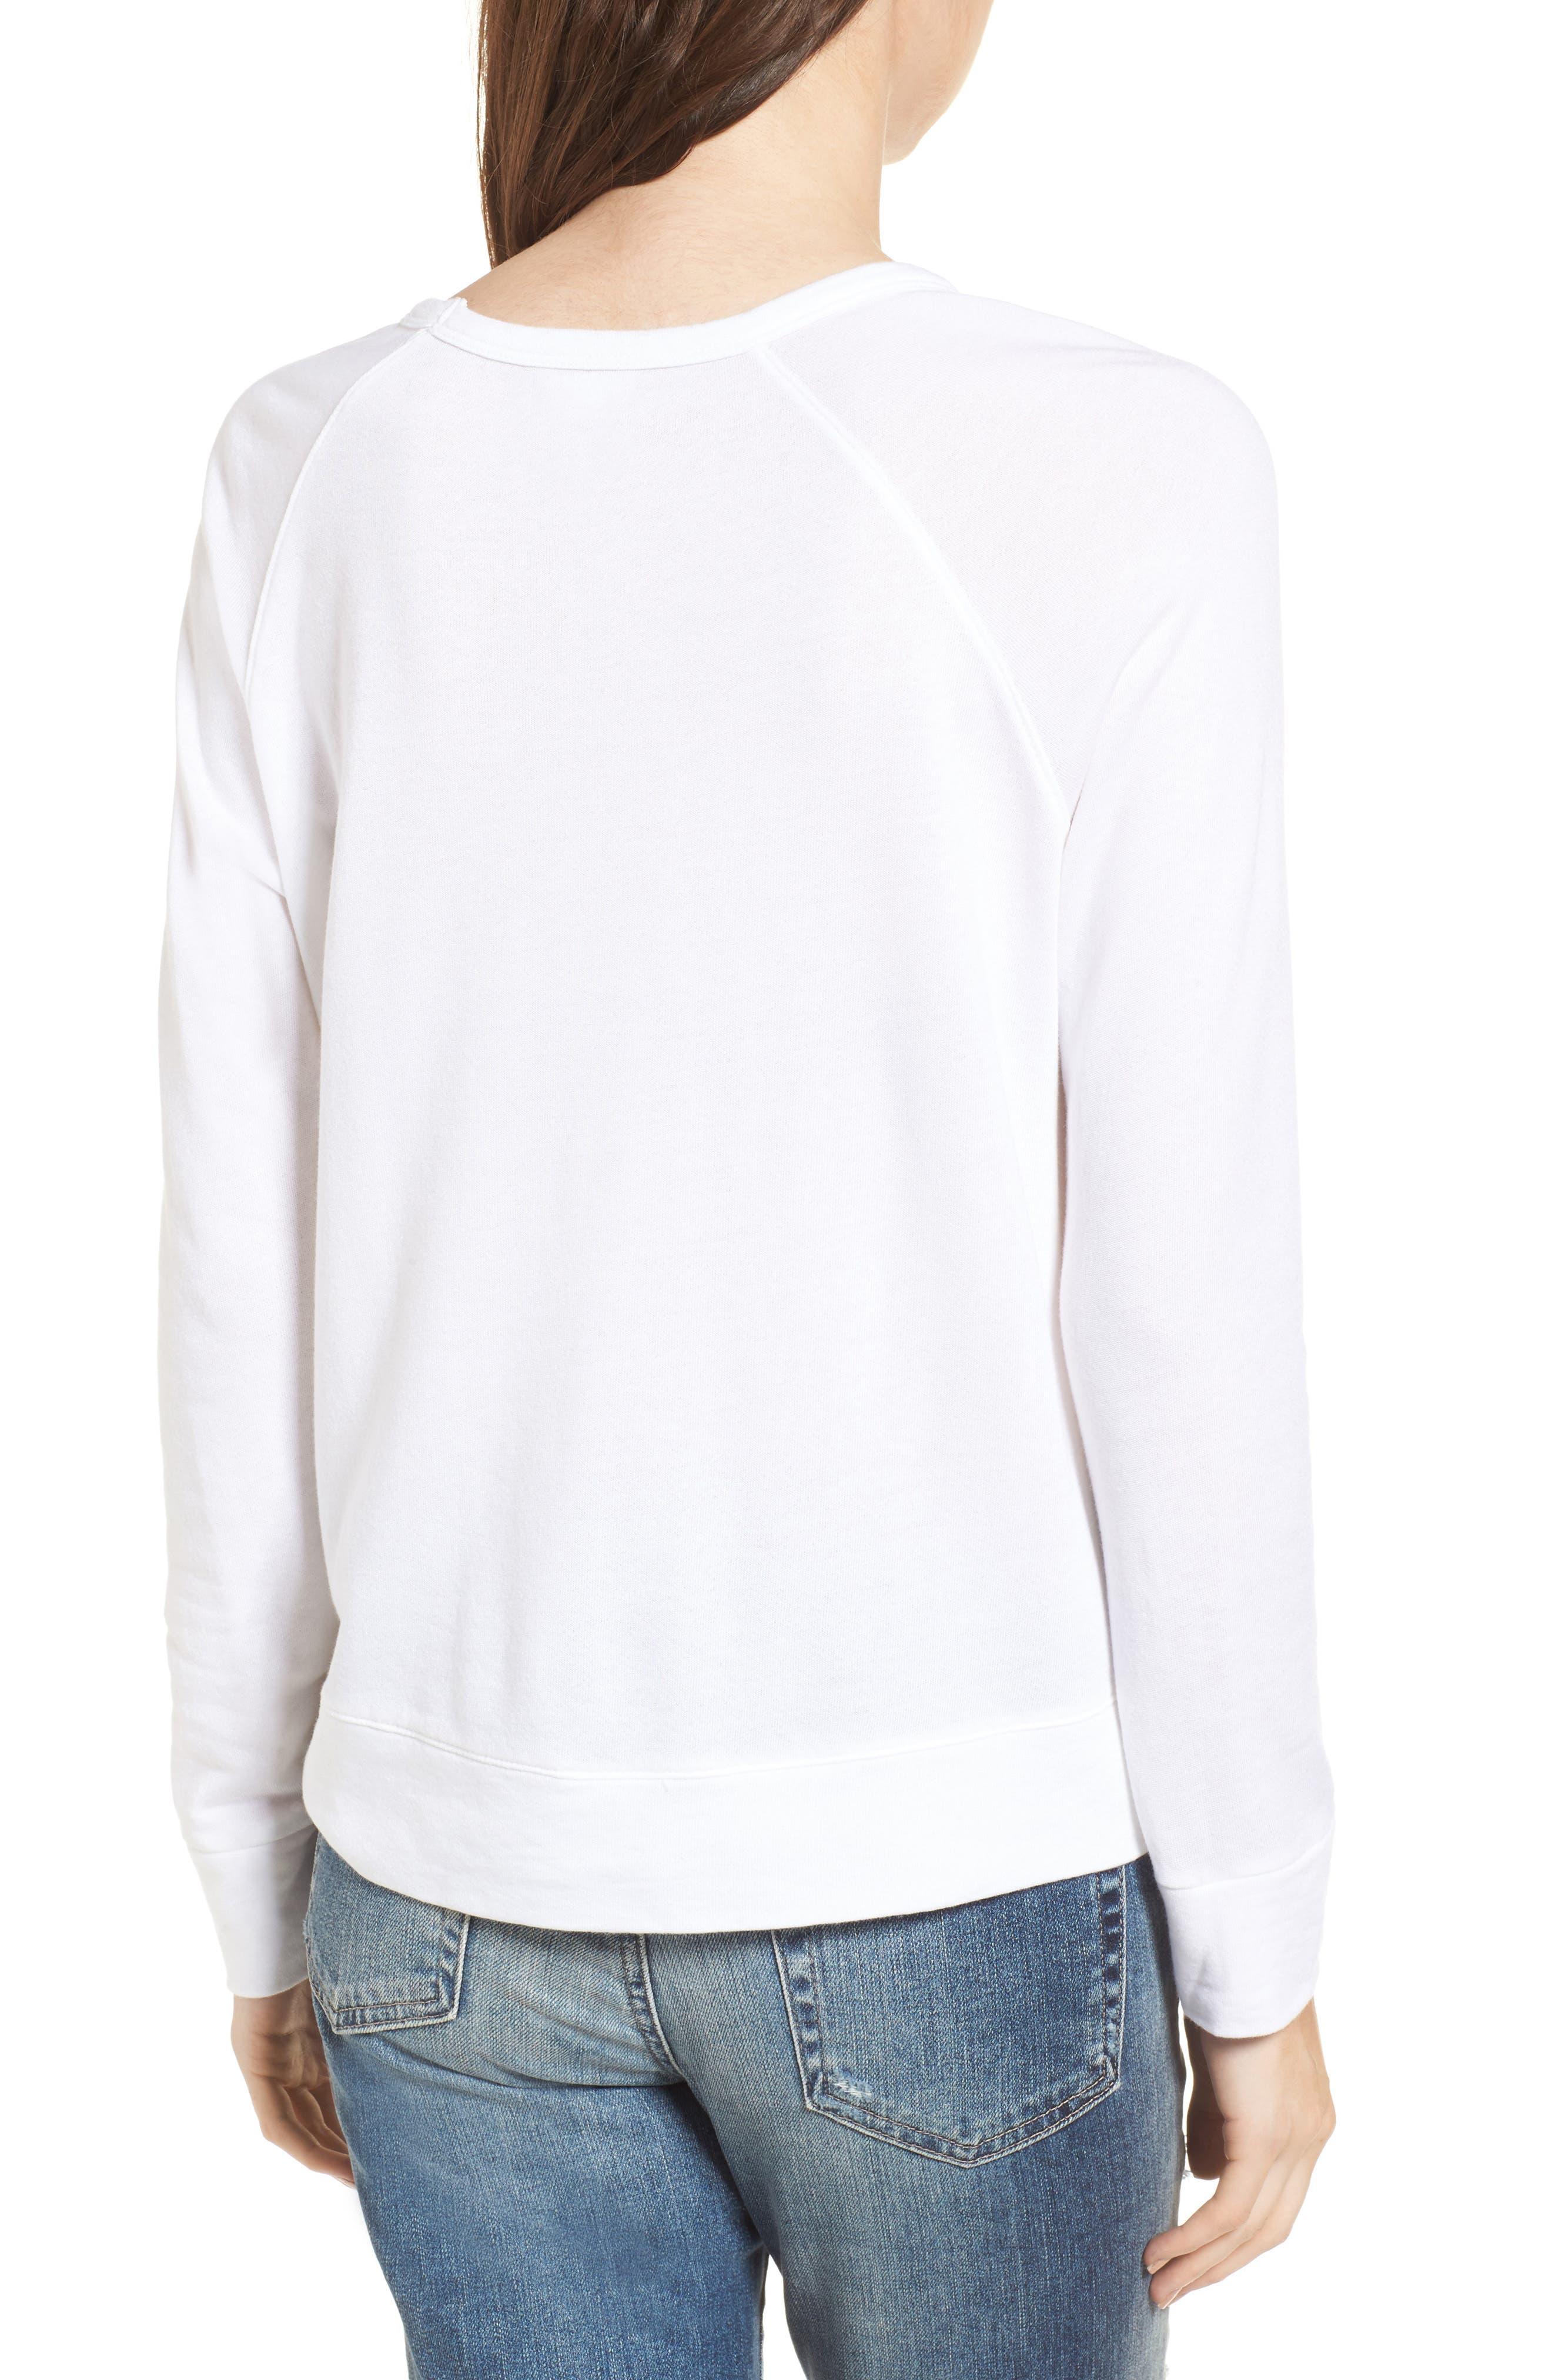 Winter Wonderland Sweatshirt,                             Alternate thumbnail 2, color,                             White